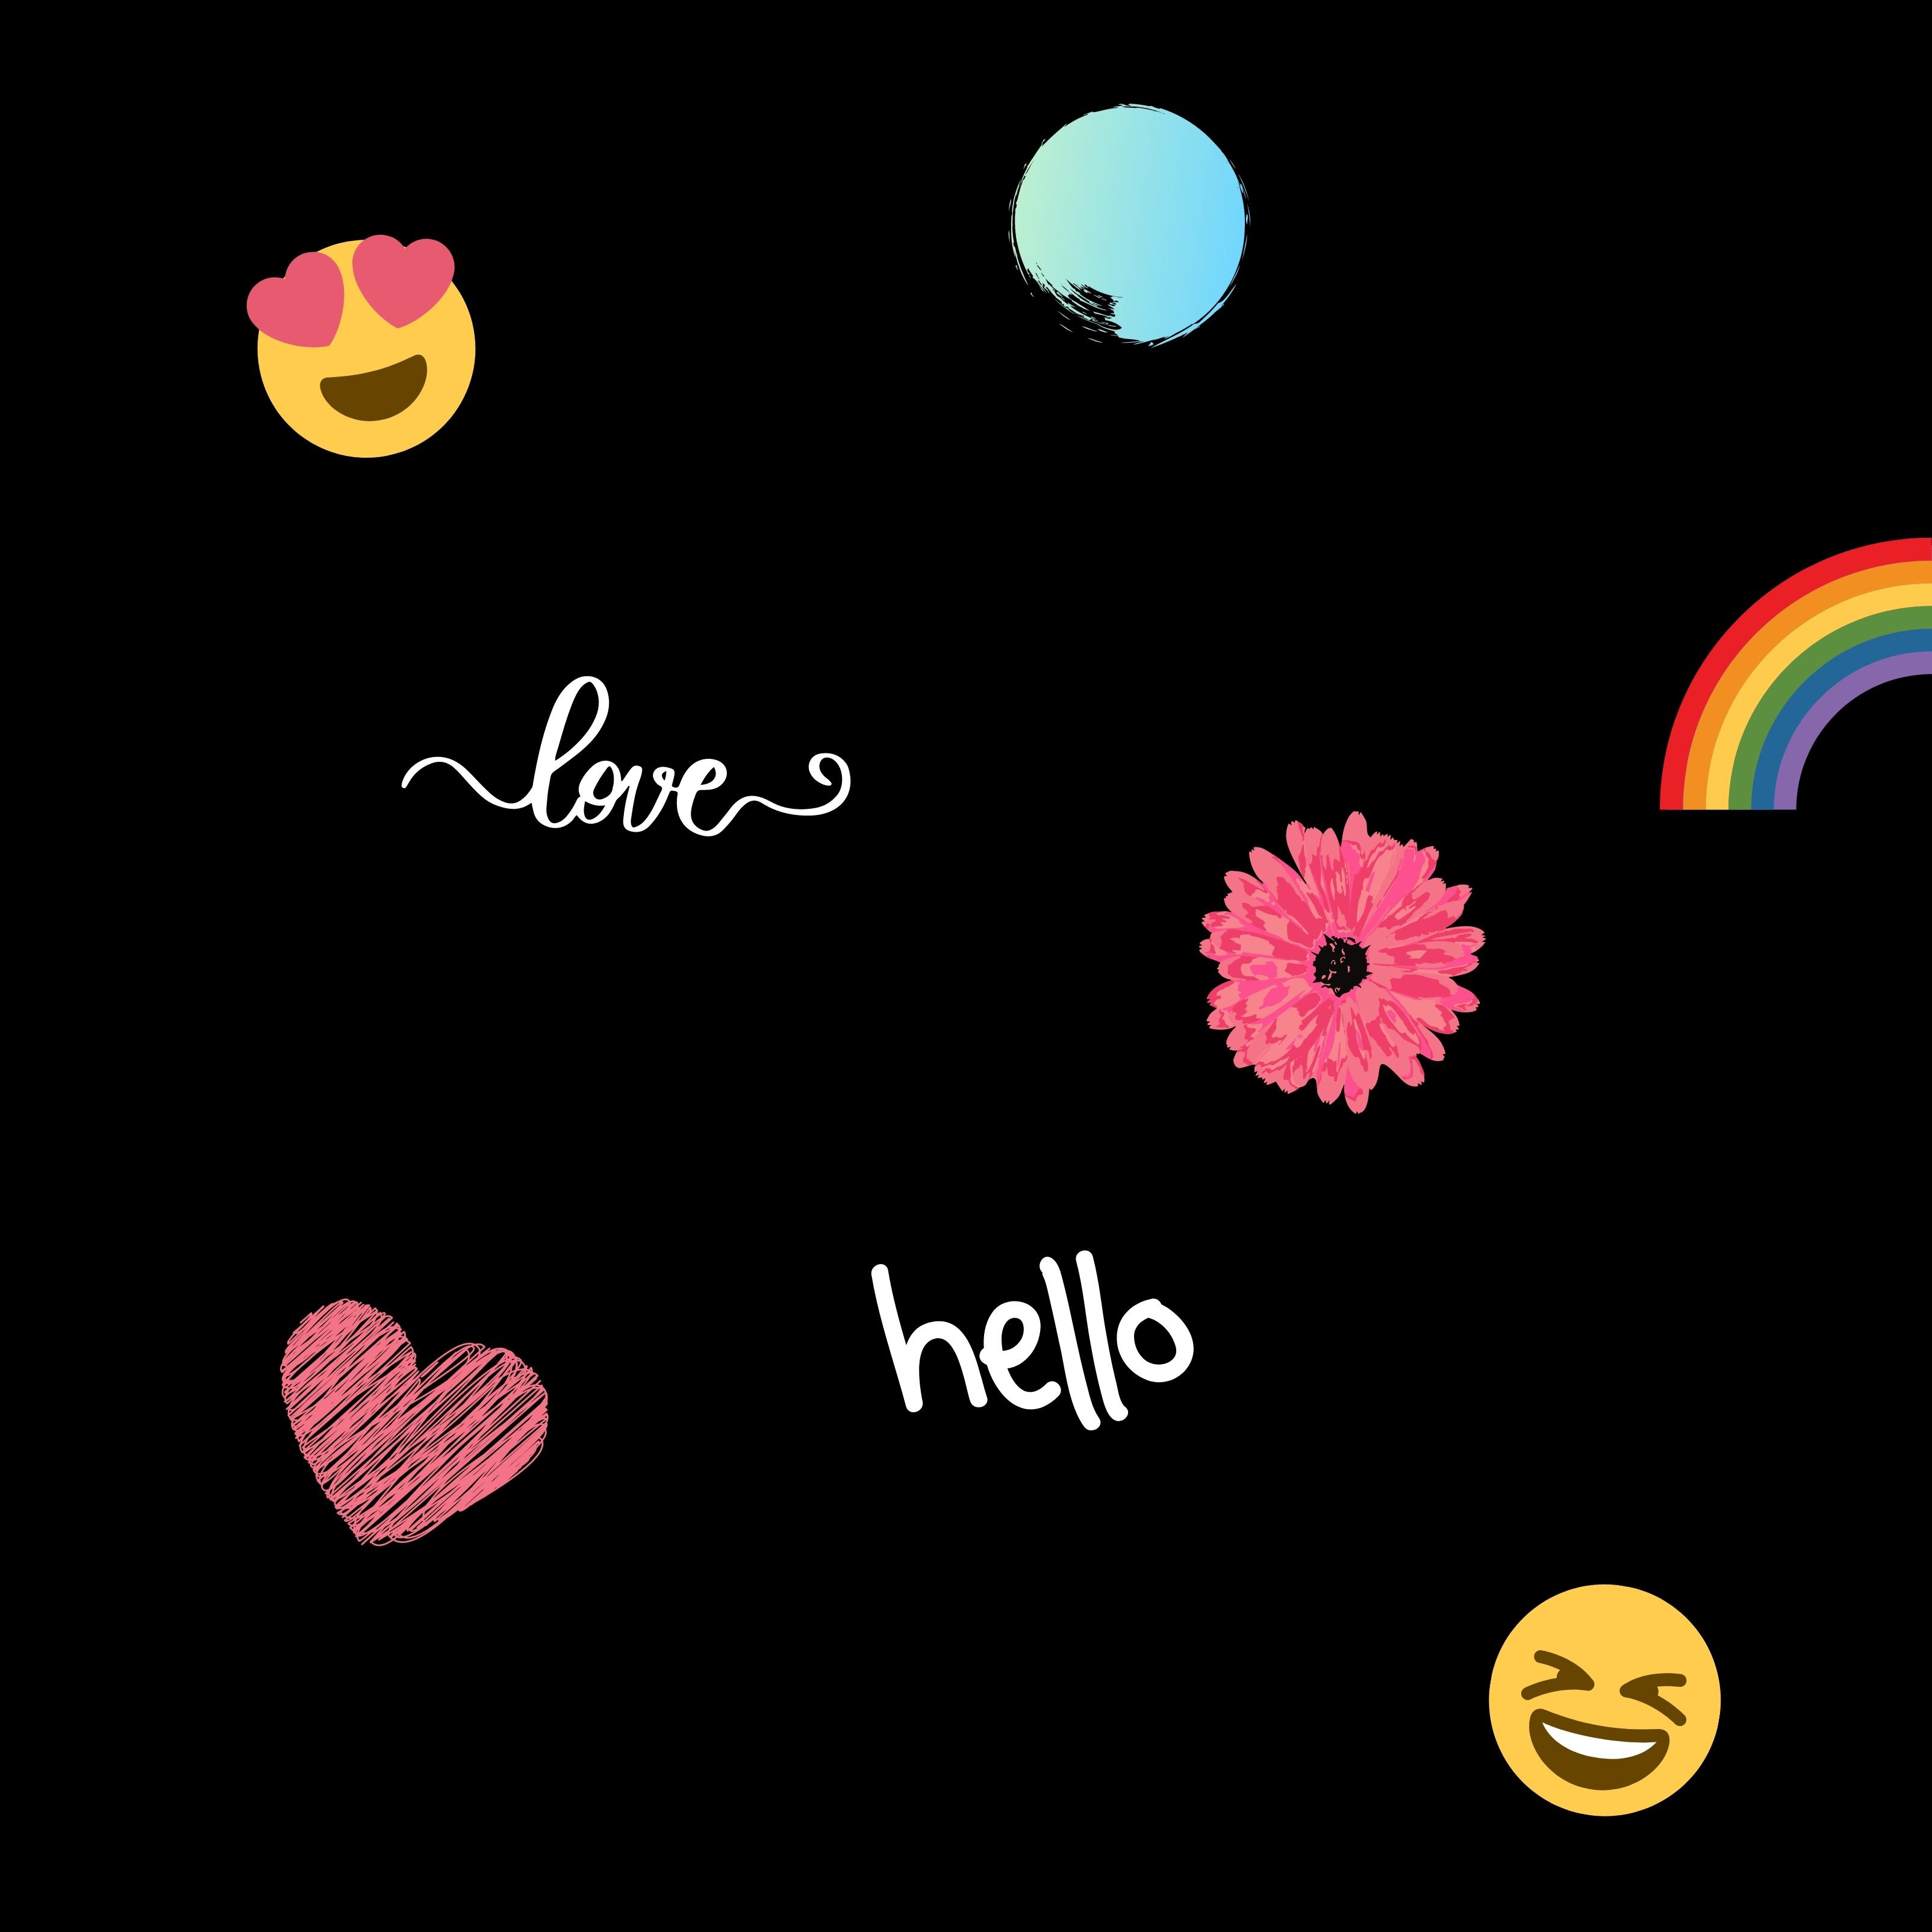 Love Fun Heart Rainbow Emoji Laughing iPad Wallpaper